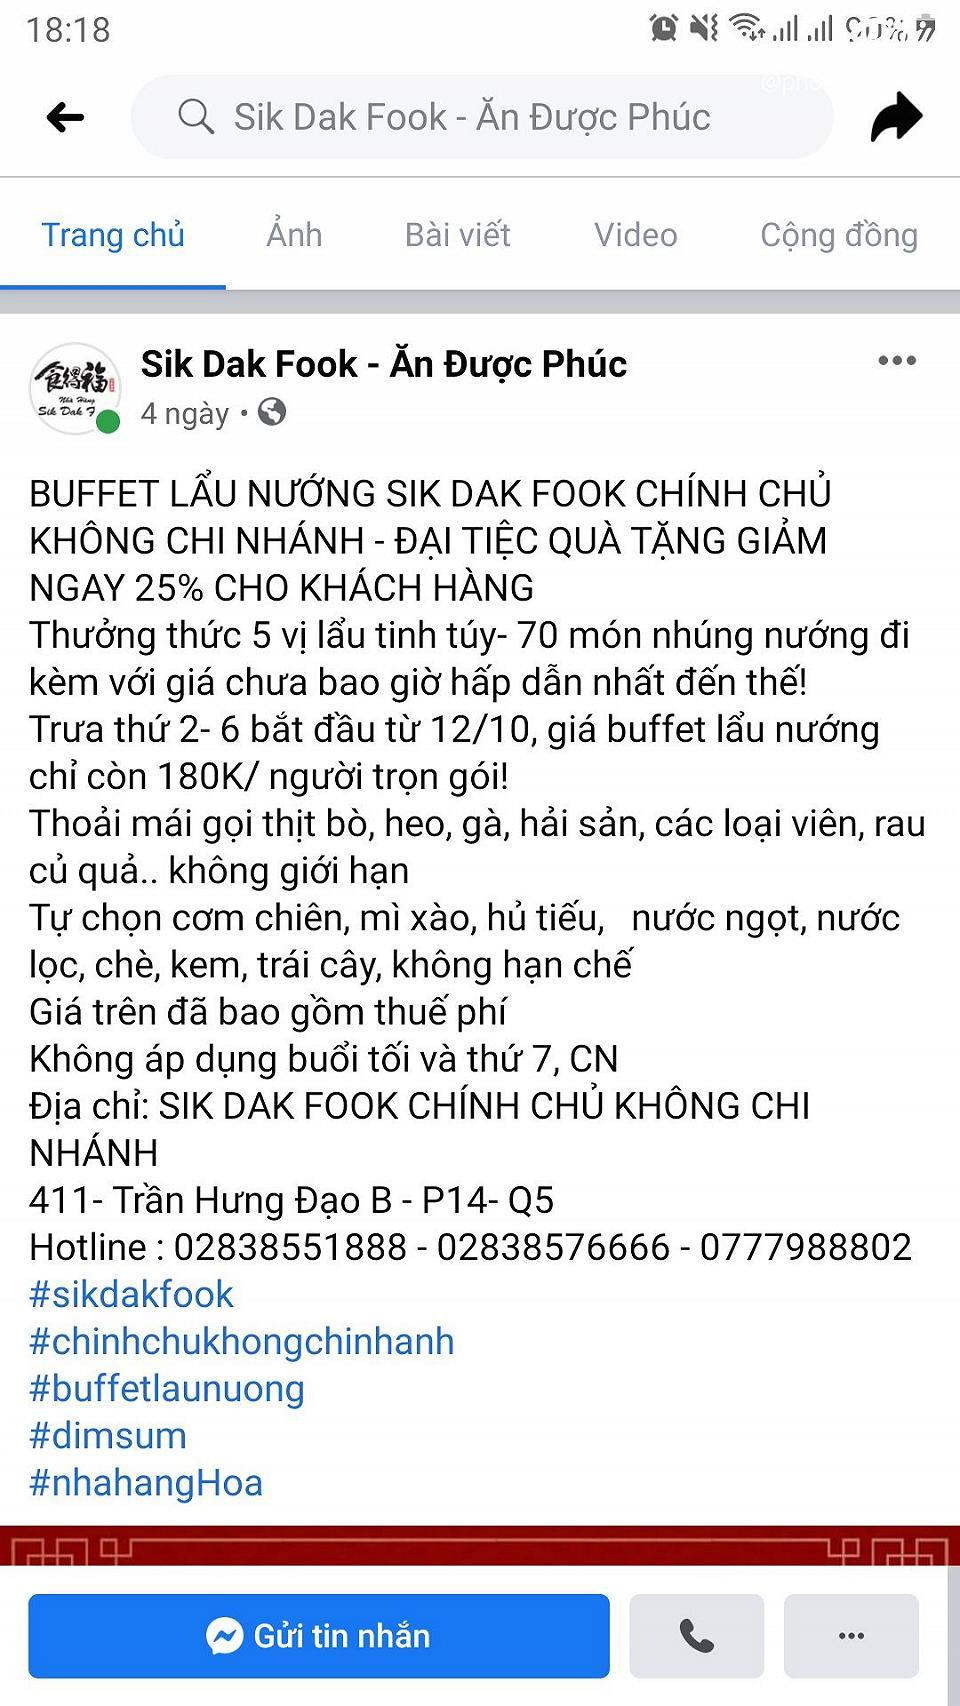 10* cho buffet lau nuong 180k sik dak food - anh 16